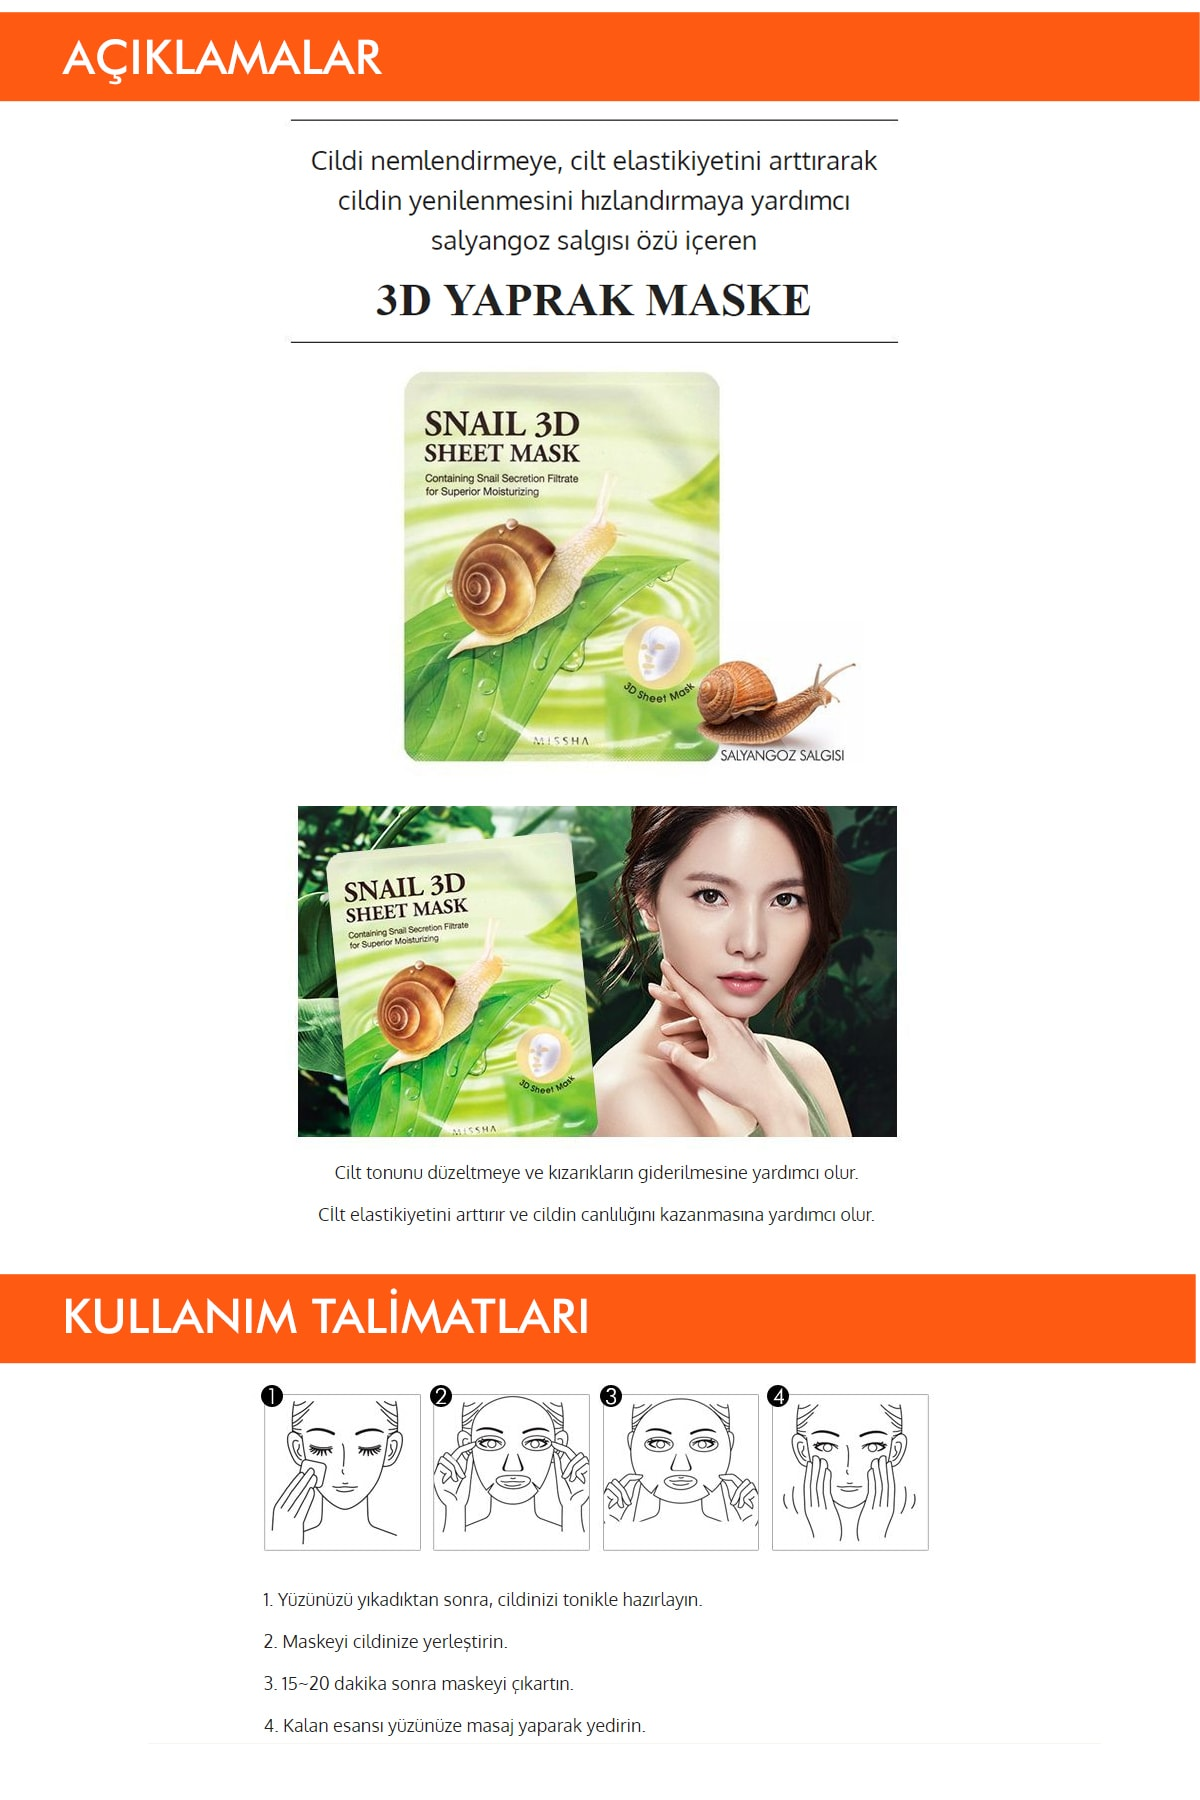 Missha Salyangoz Özlü Onarıcı Yaprak Maske (23g) Snail Healing 3D Sheet Mask 1